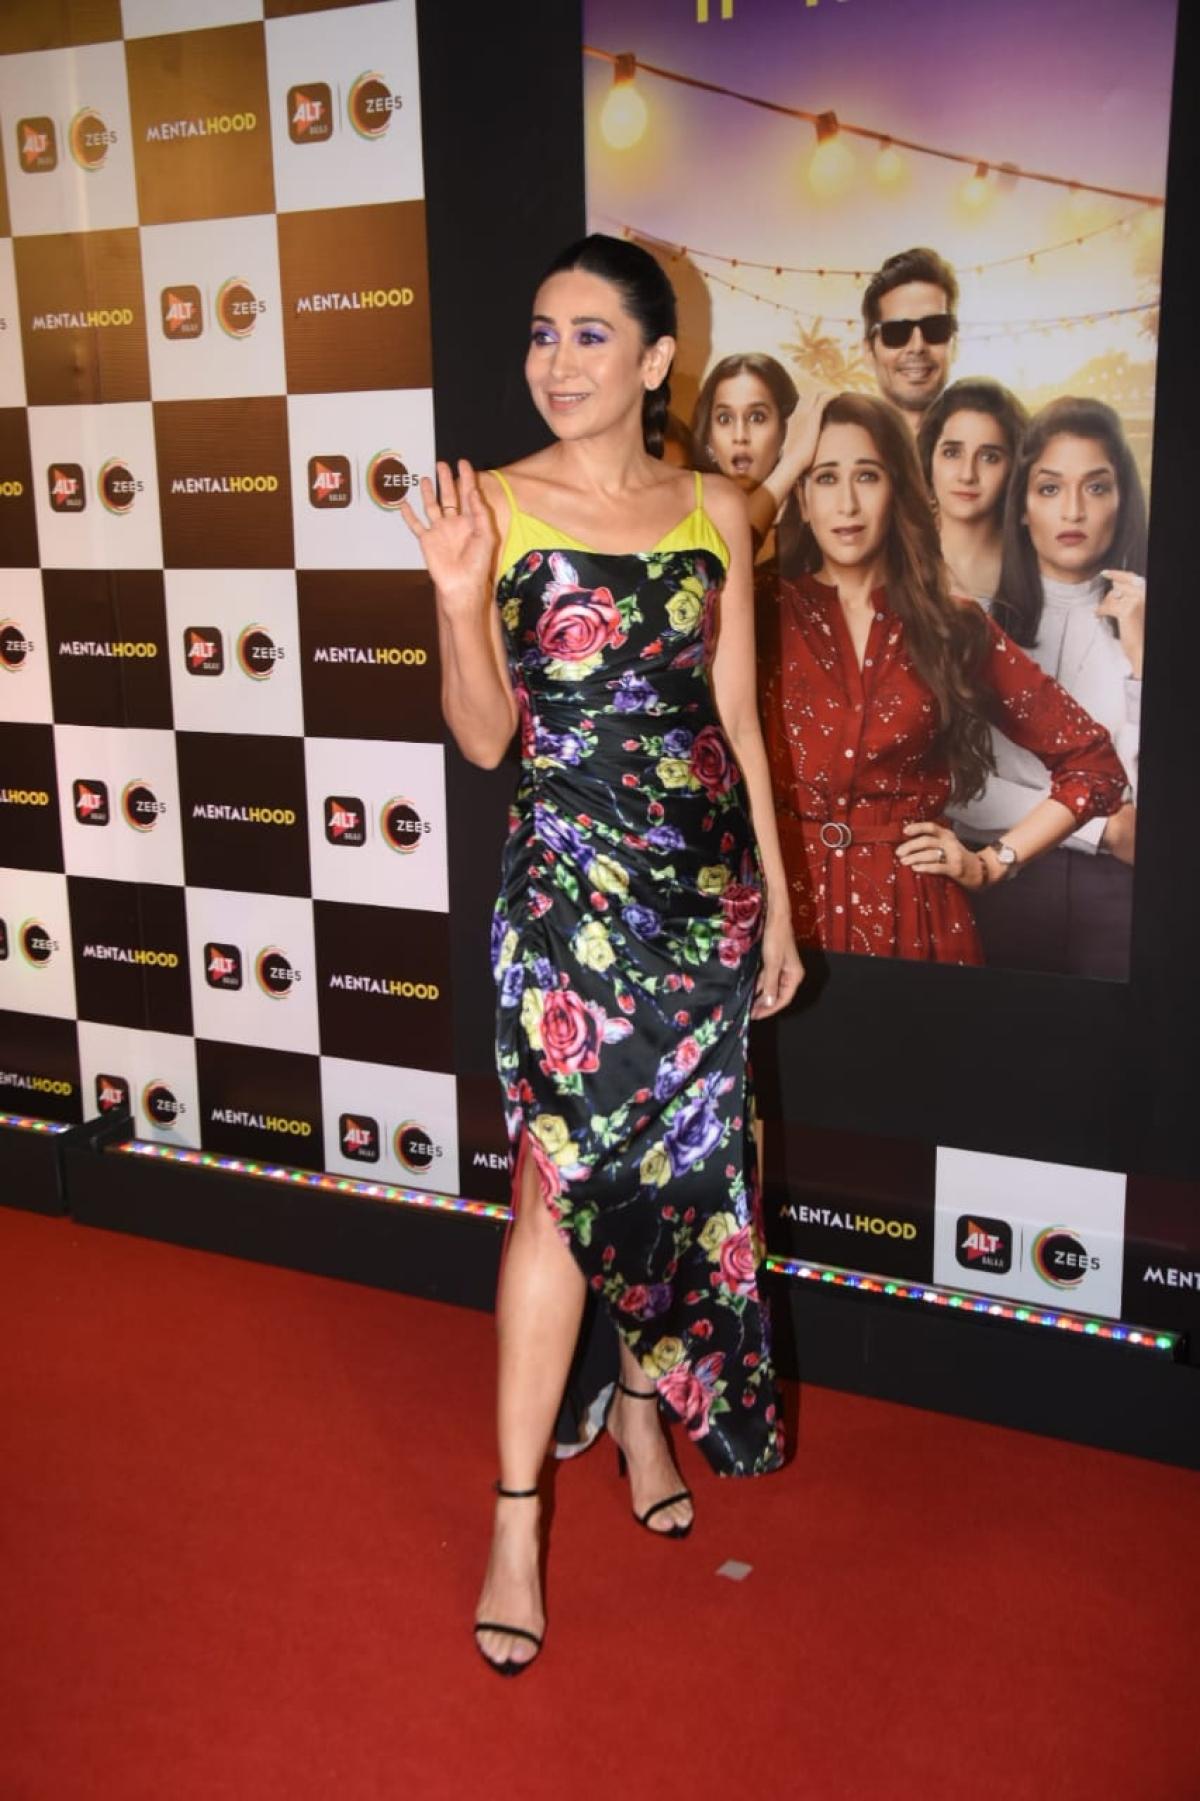 Watch Video: Babita Kapoor imitates daughter Karisma Kapoor's 'Mentalhood' poster